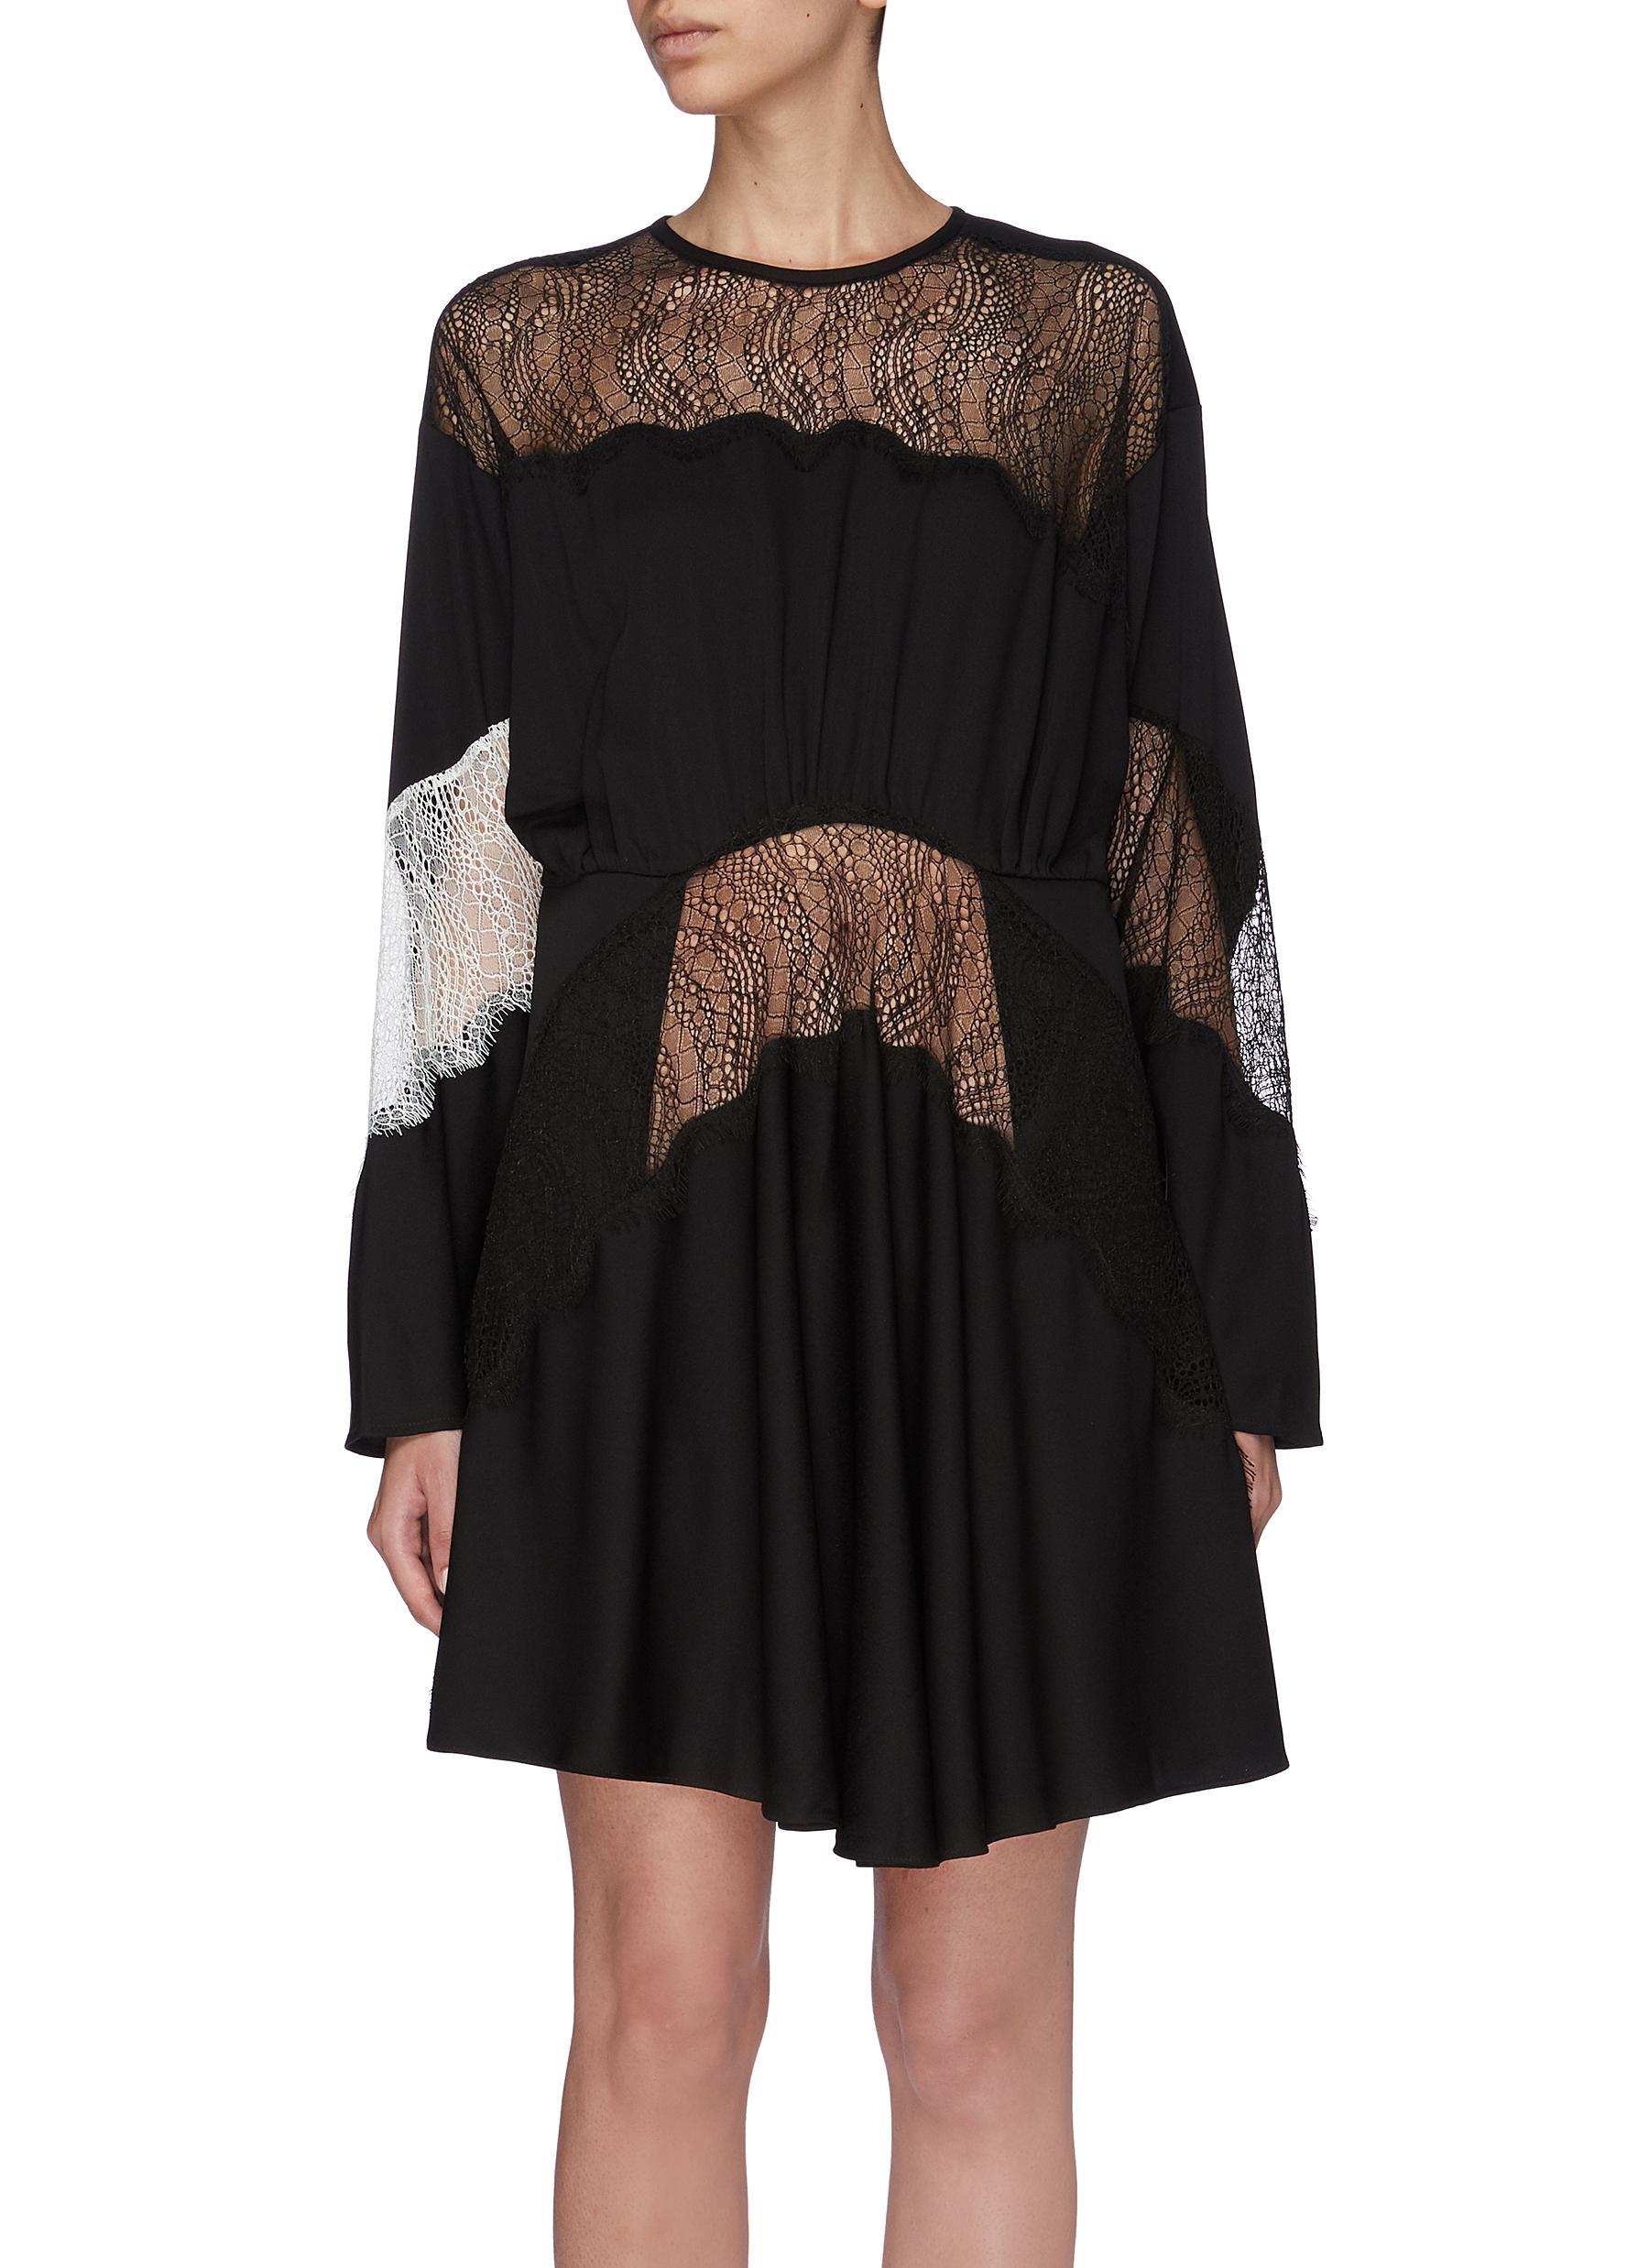 Lace insert gathered mini dress by Christopher Esber